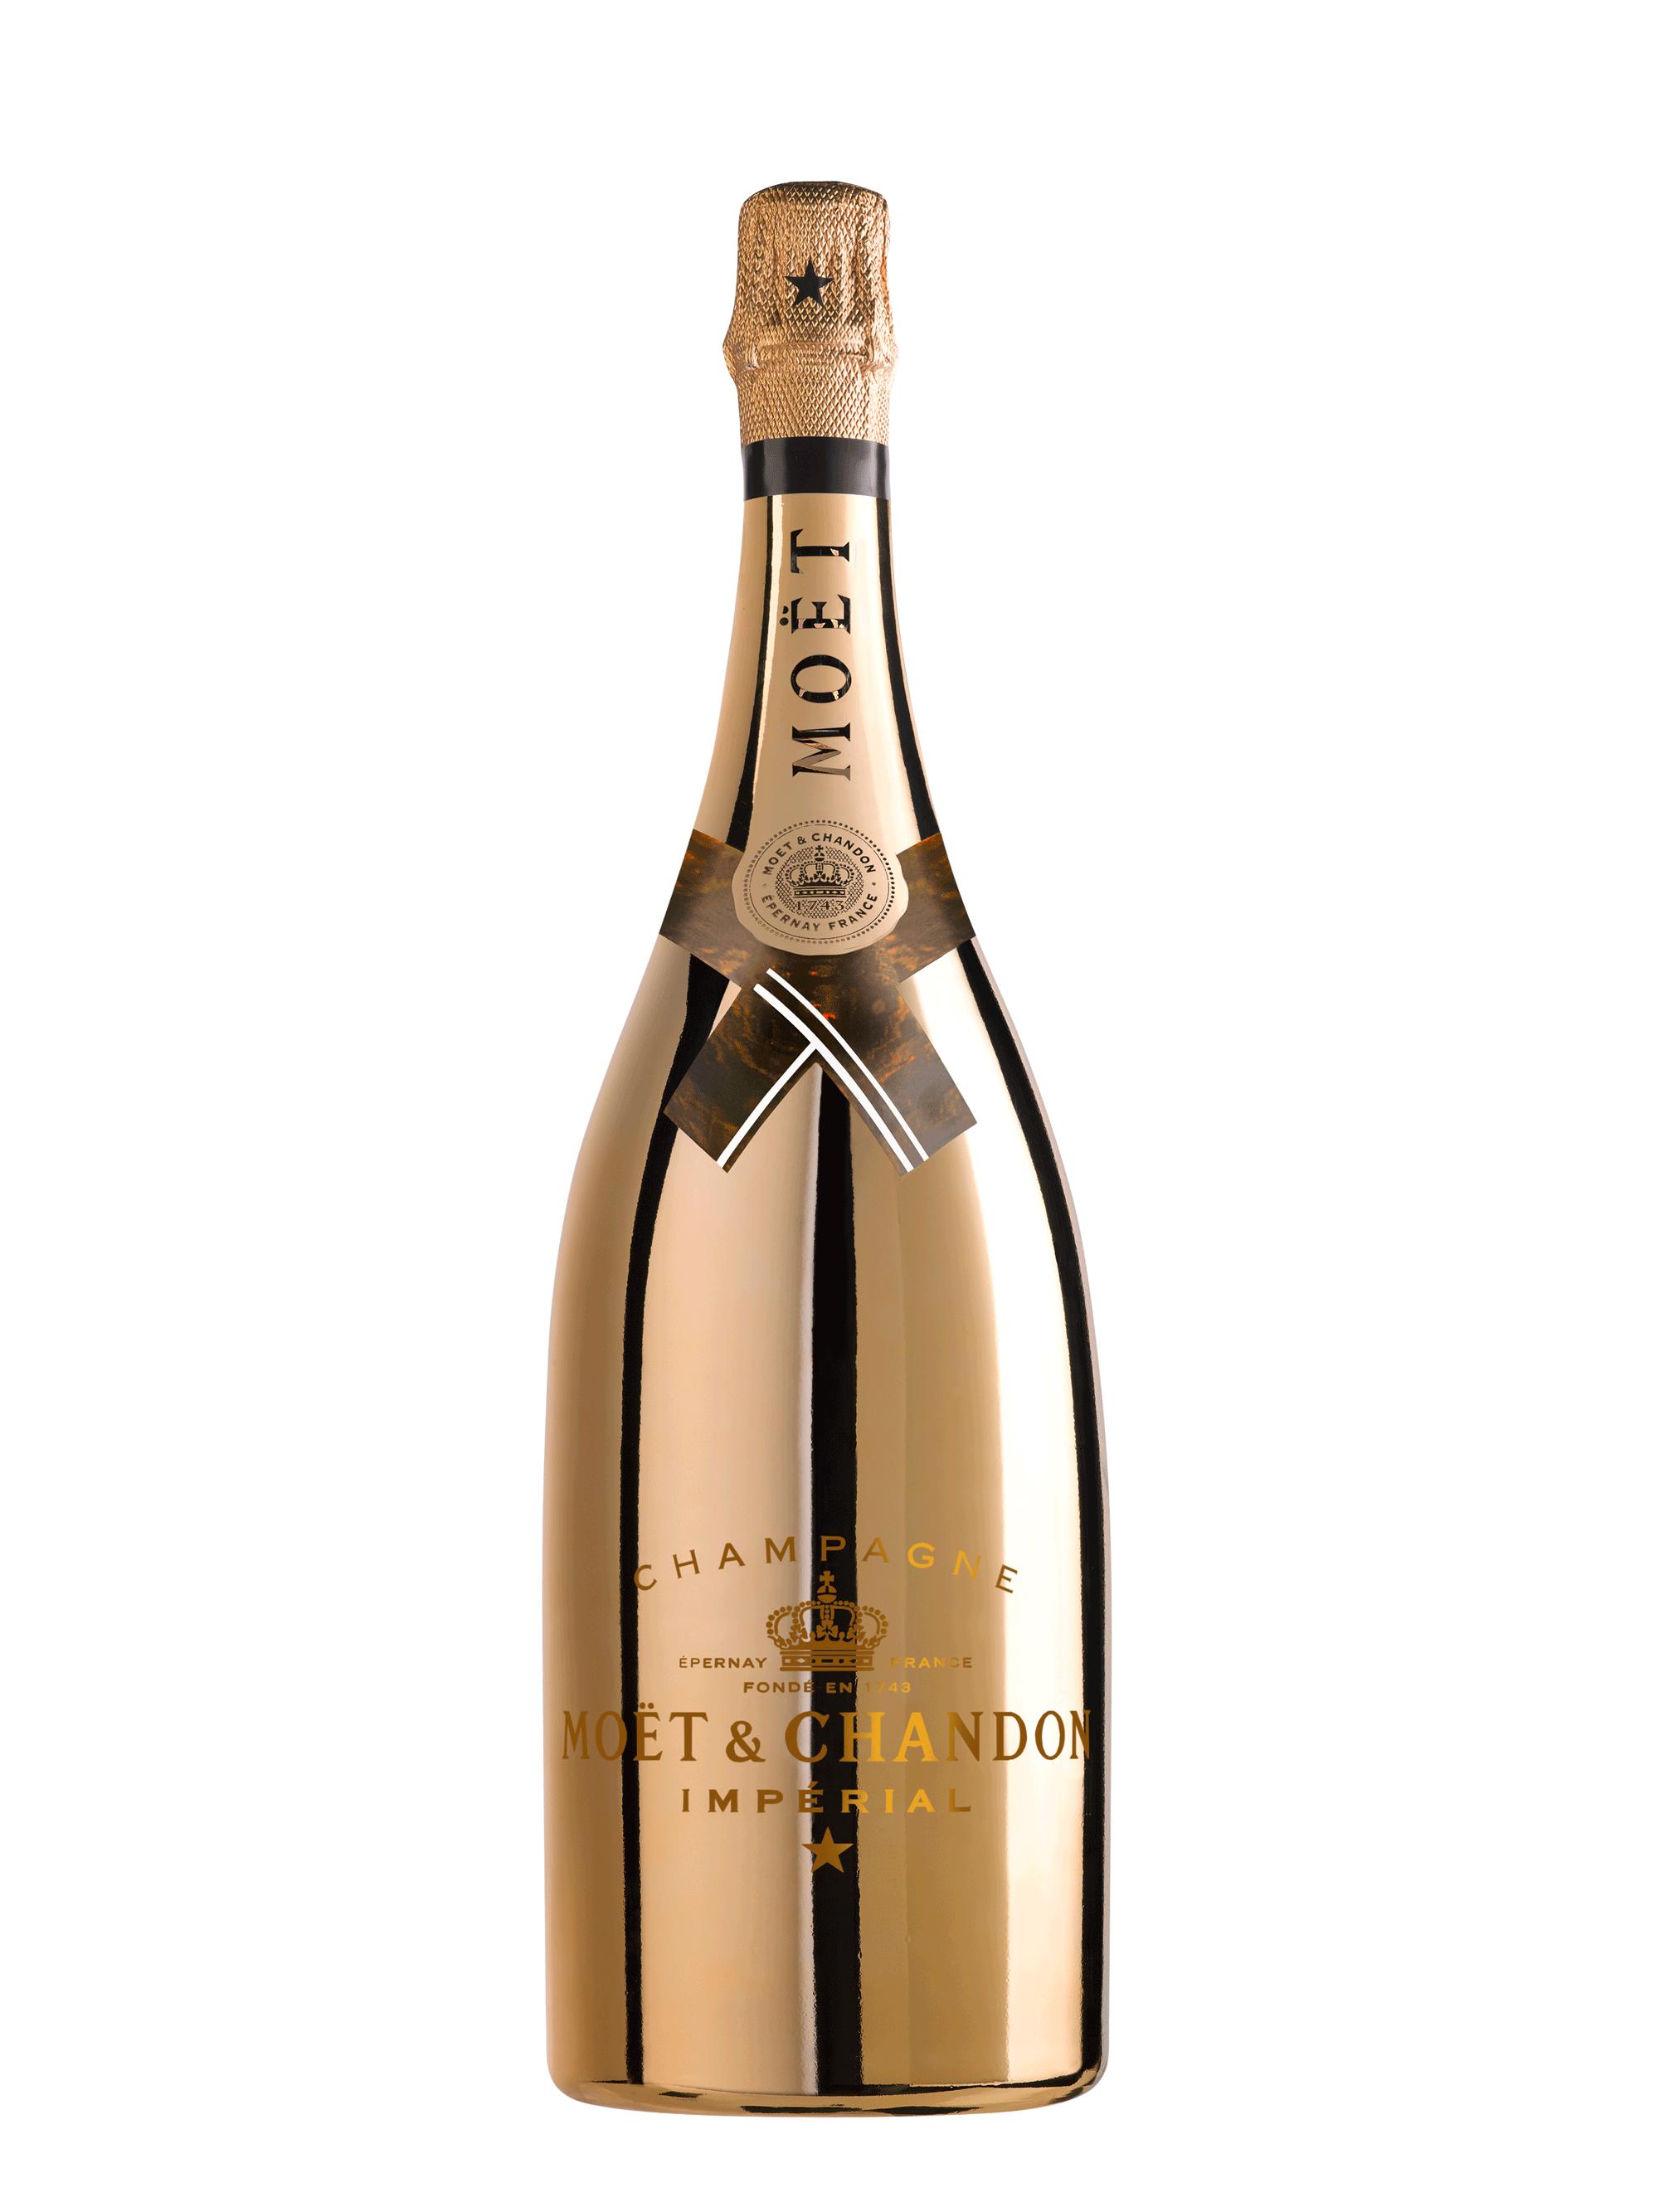 Mo t chandon brut. Gold champagne bottle png